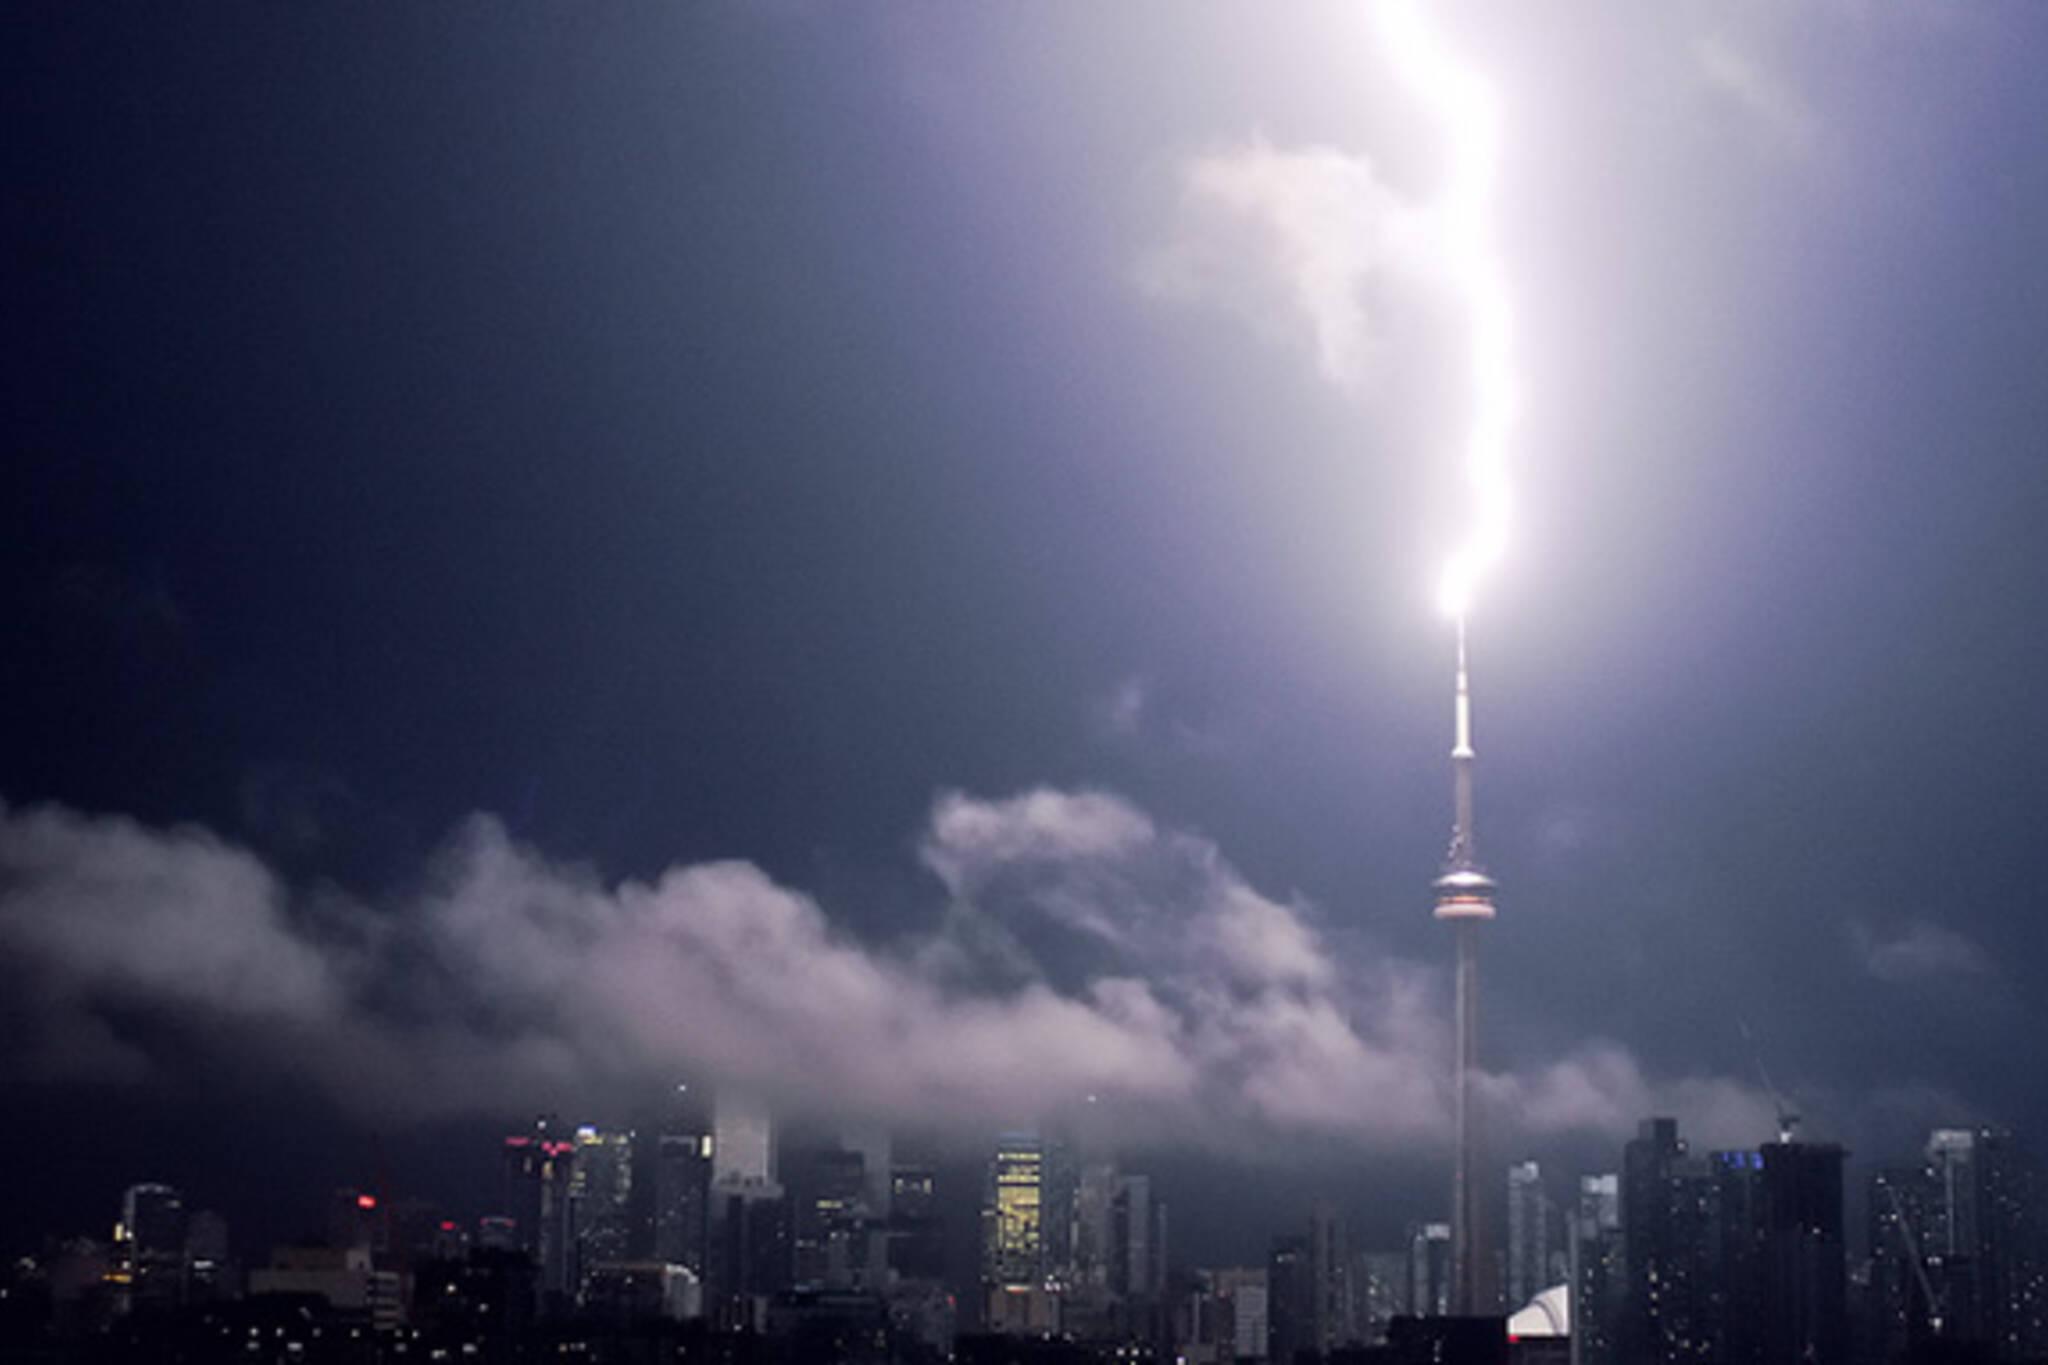 Toronto Lightning Storm August 2011